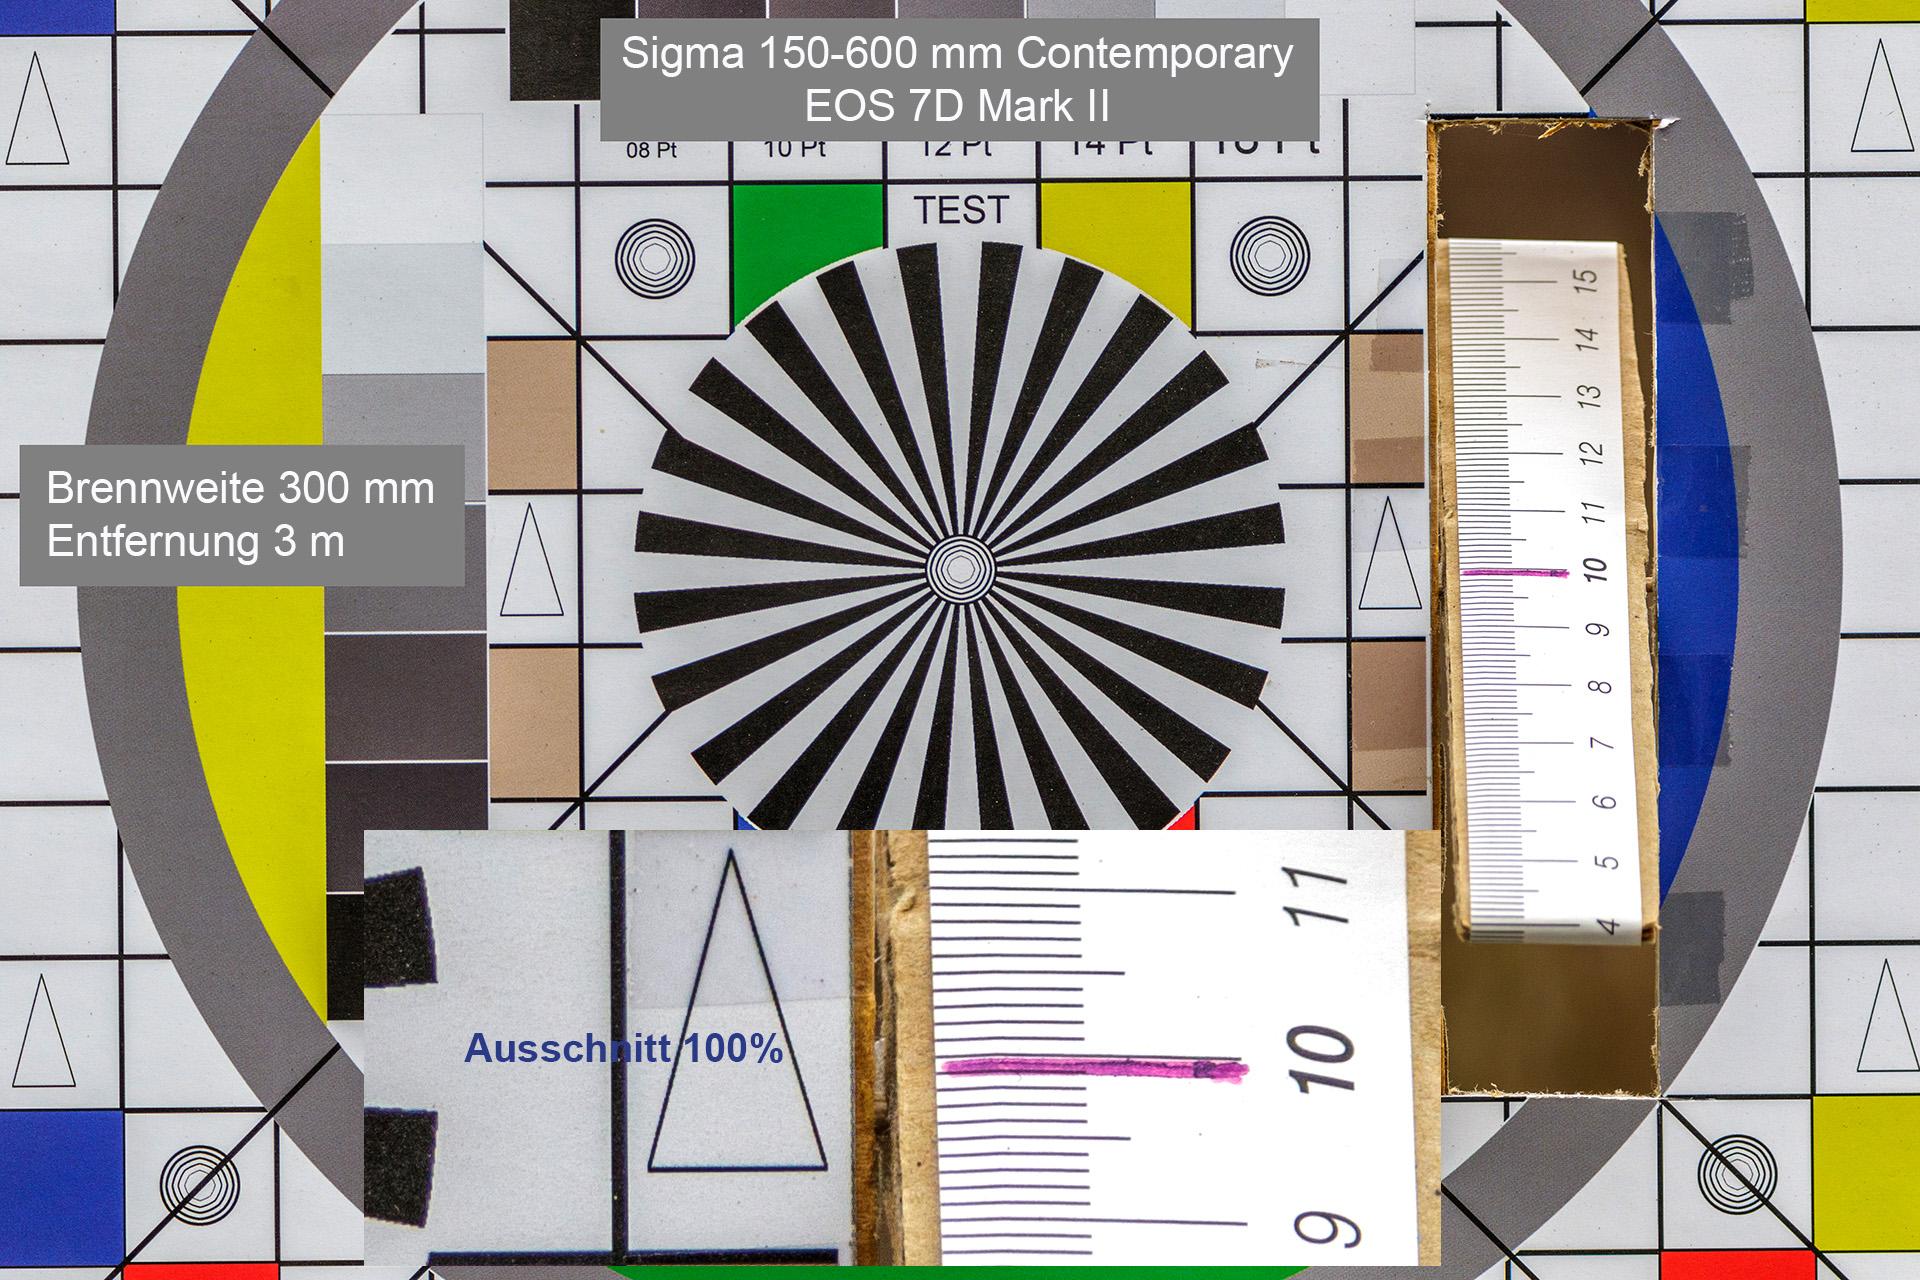 Testaufnahmen, Sigma 150-600 mm, 7D Mark II, 3 Meter, 300 mm